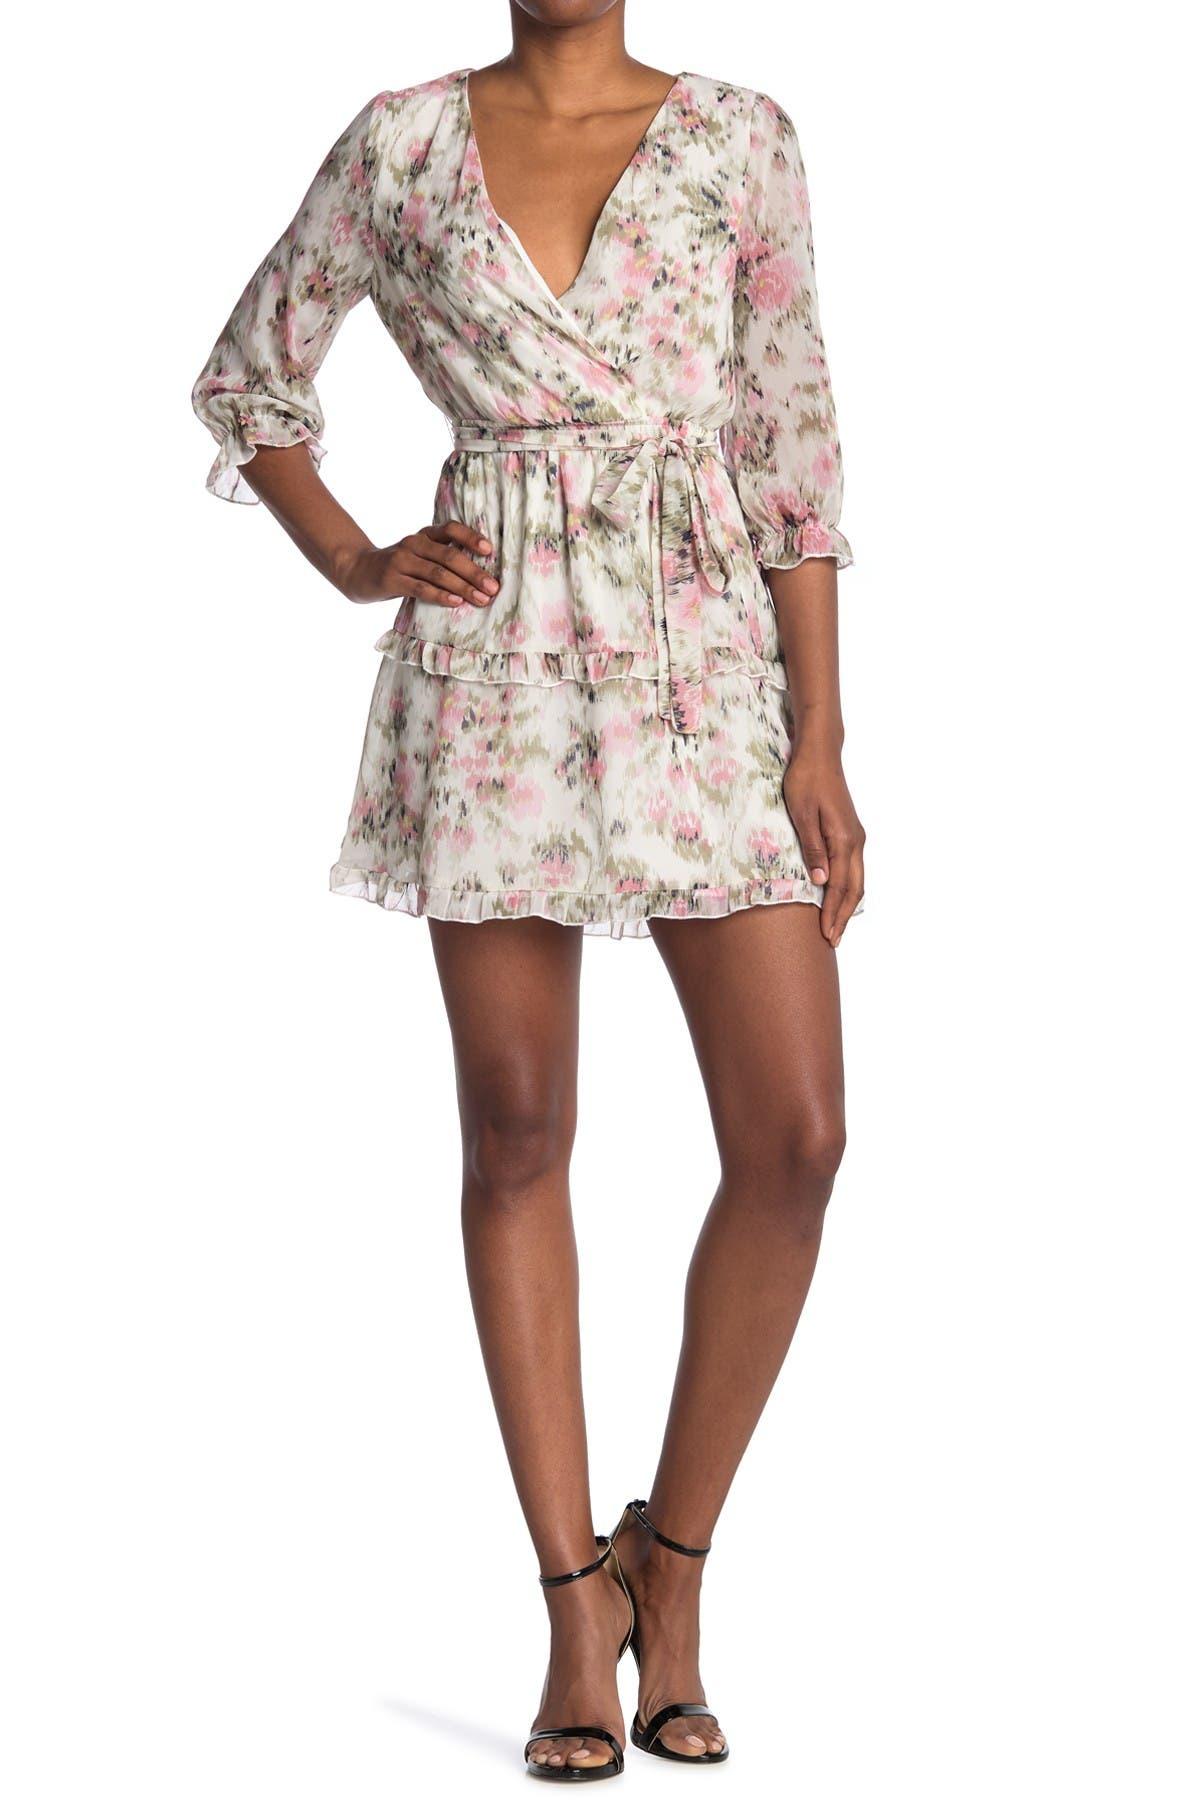 Image of KENEDIK Ruffle Trim Floral Print Surplice Neck Dress